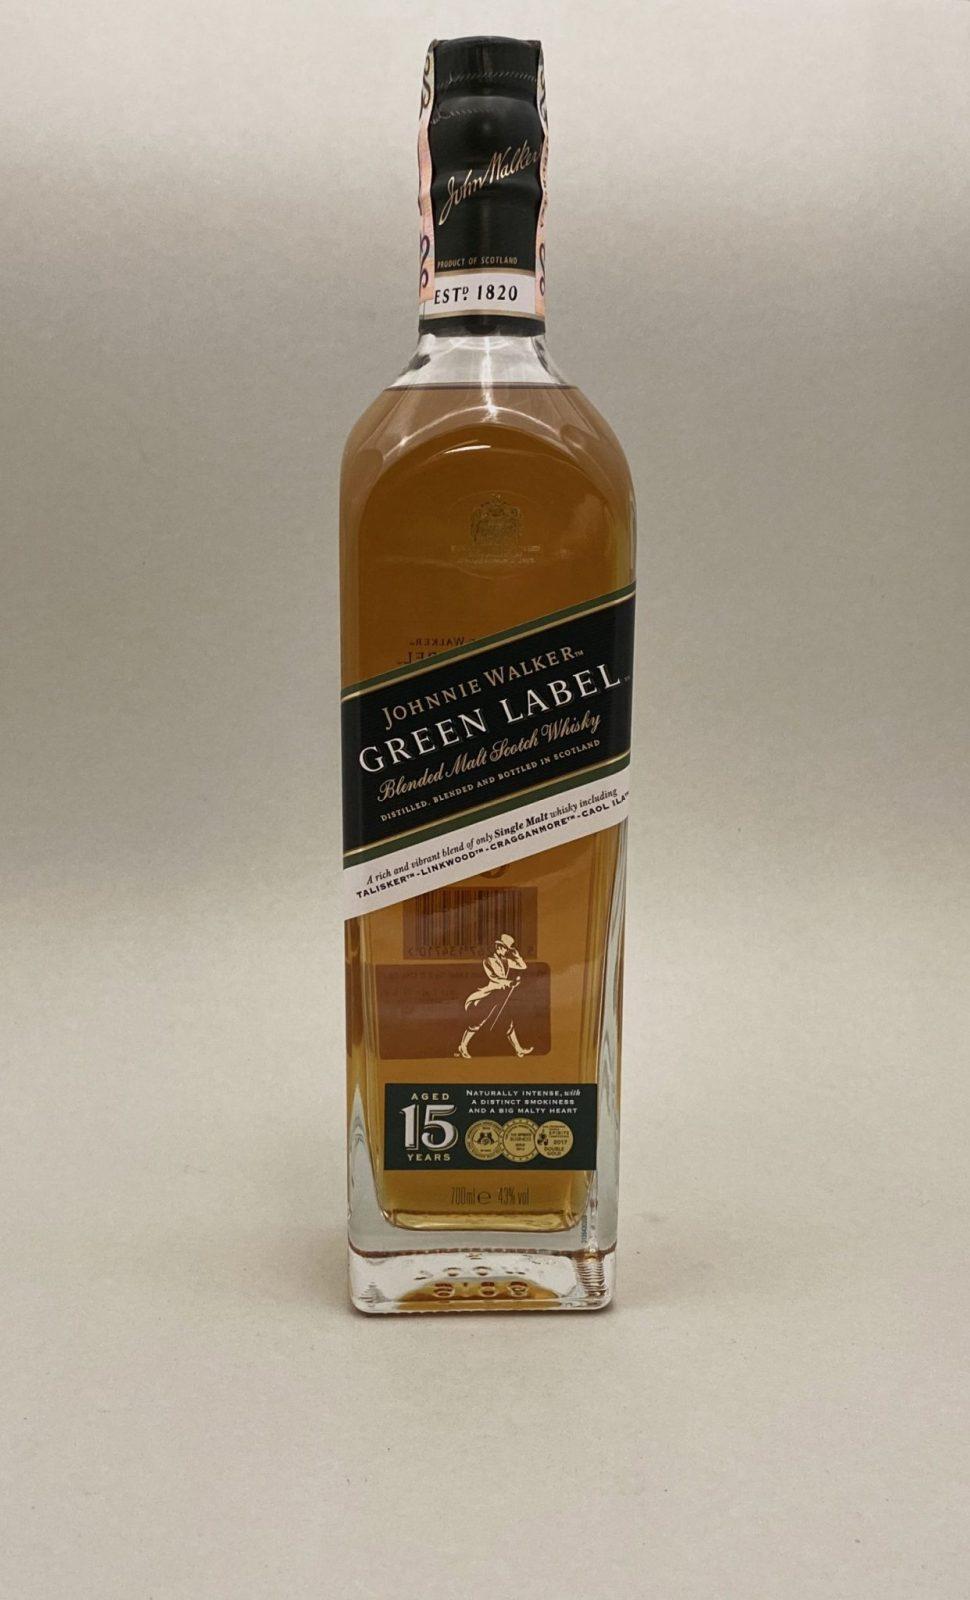 Johnnie Walker Green Label 40%, Bottleshop Sunny wines slnecnice mesto, petrzalka, Škótska Whisky, rozvoz alkoholu, eshop